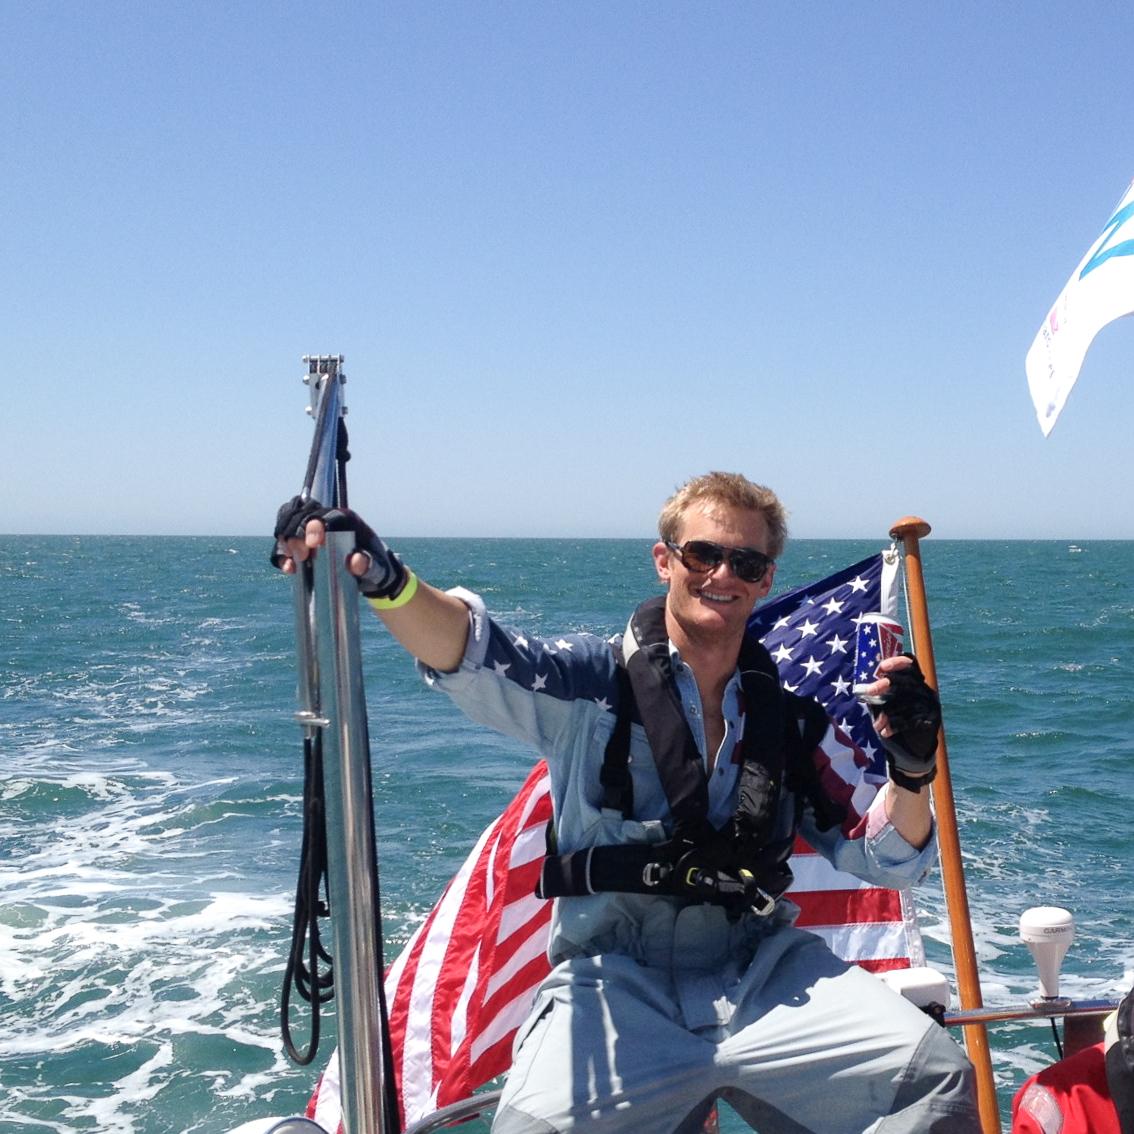 brother-alue-optics-nine-sailing-offshore.jpg